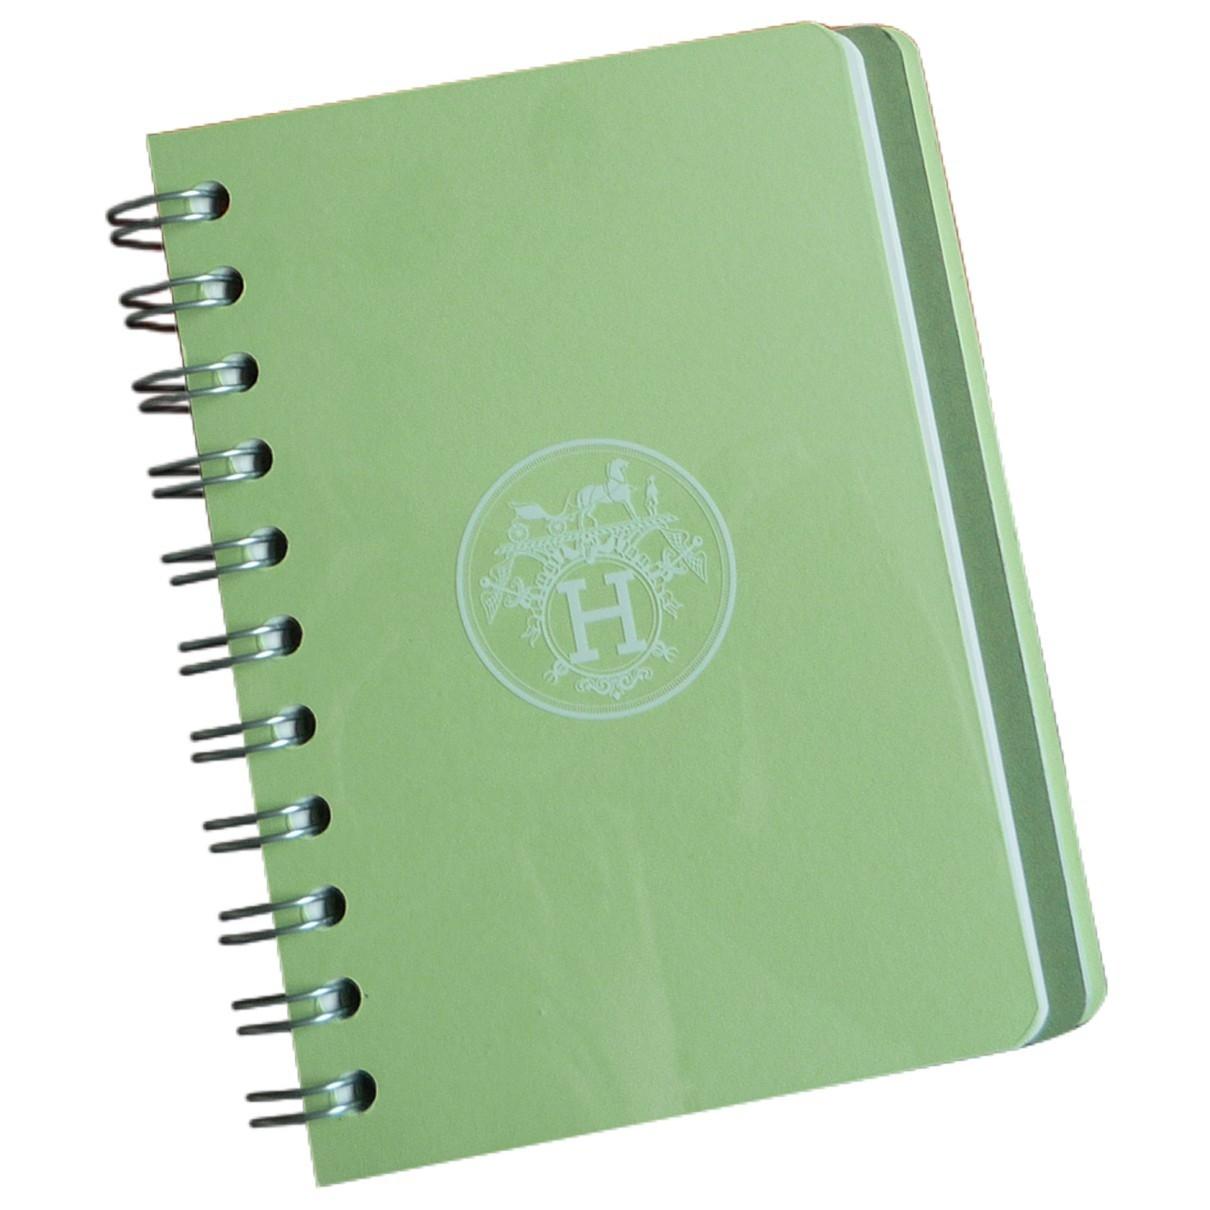 Cuaderno Hermes